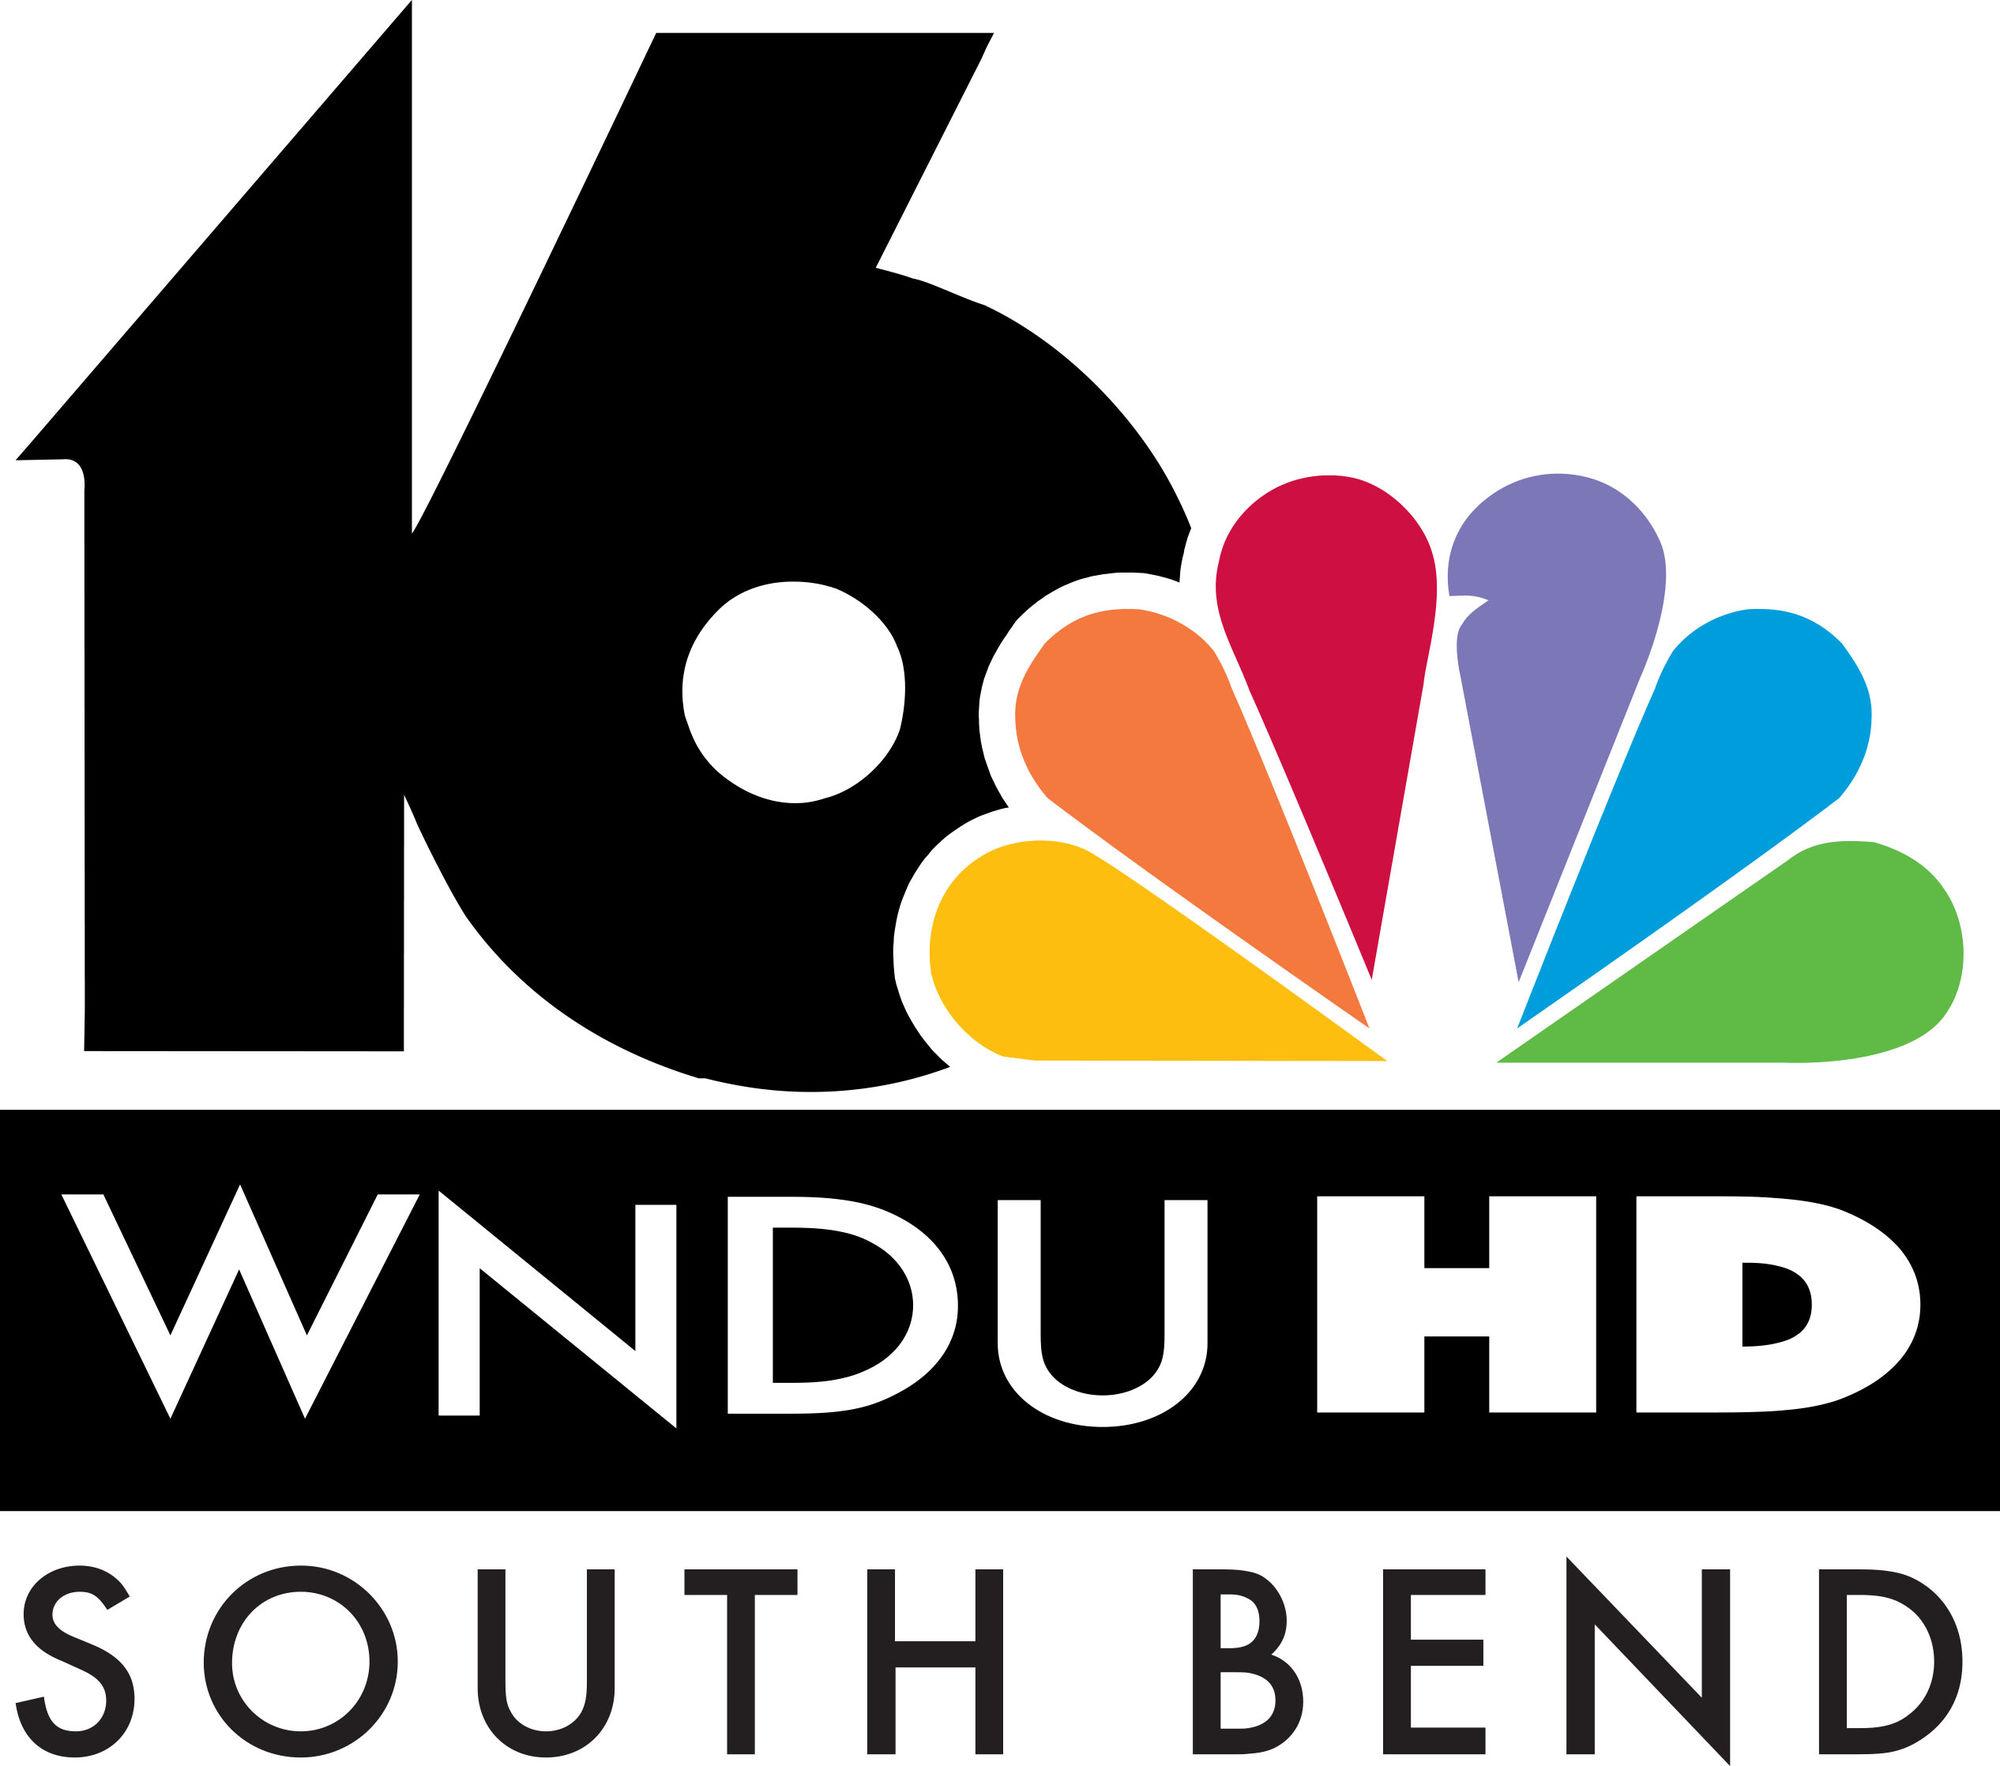 WNDU - Channel 16